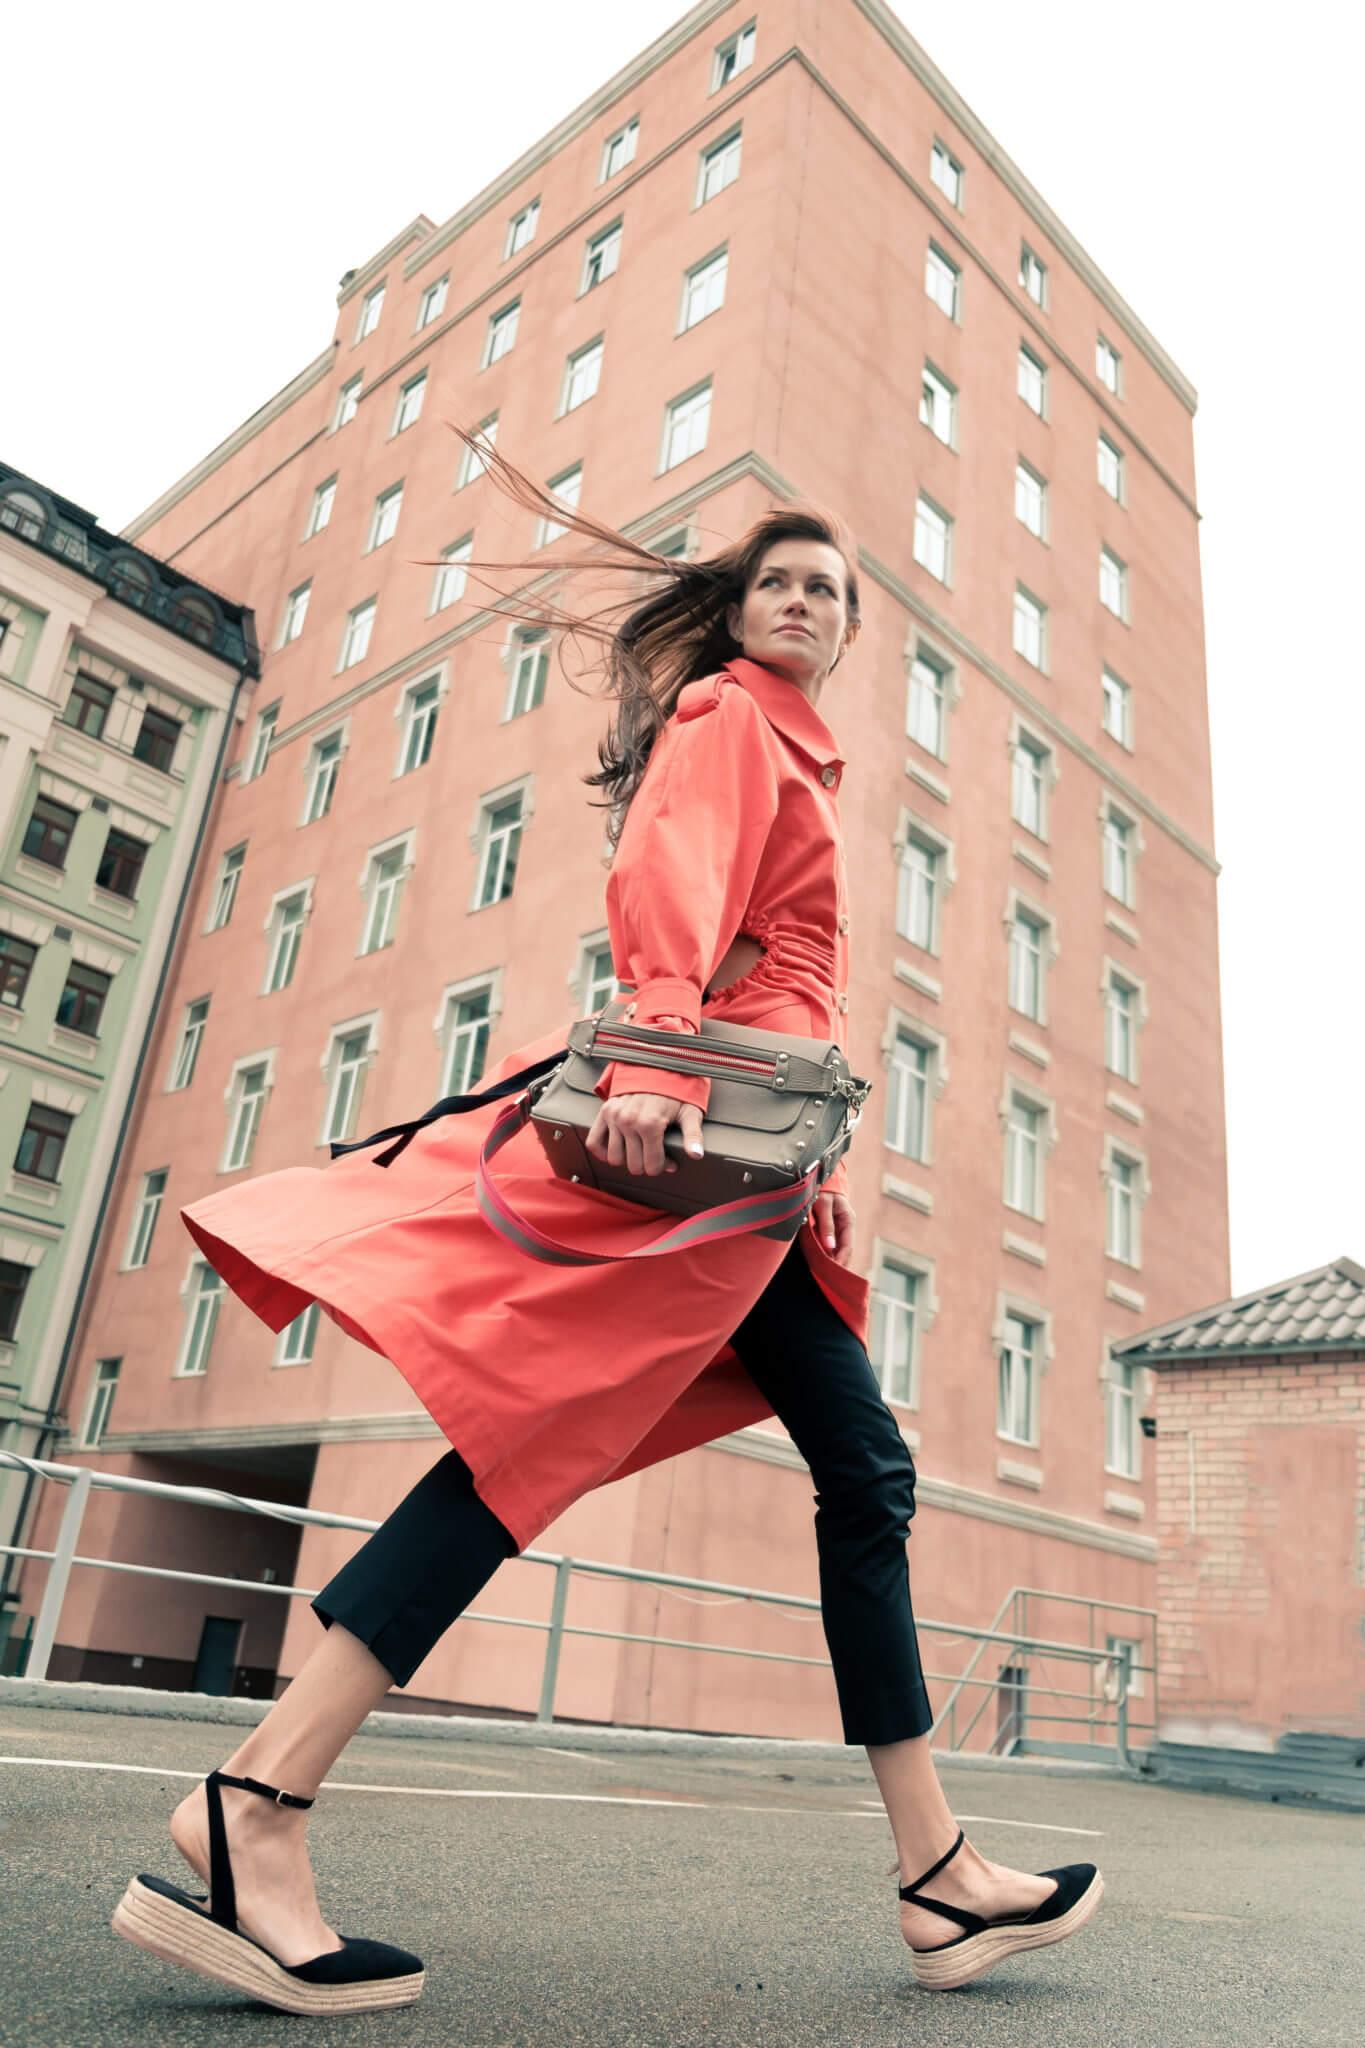 Рекламная съемка для бренда #proSTORELUCHYNSKA. Ph Постникова, уличная съемка, девушка в красном пальто на фоне здания